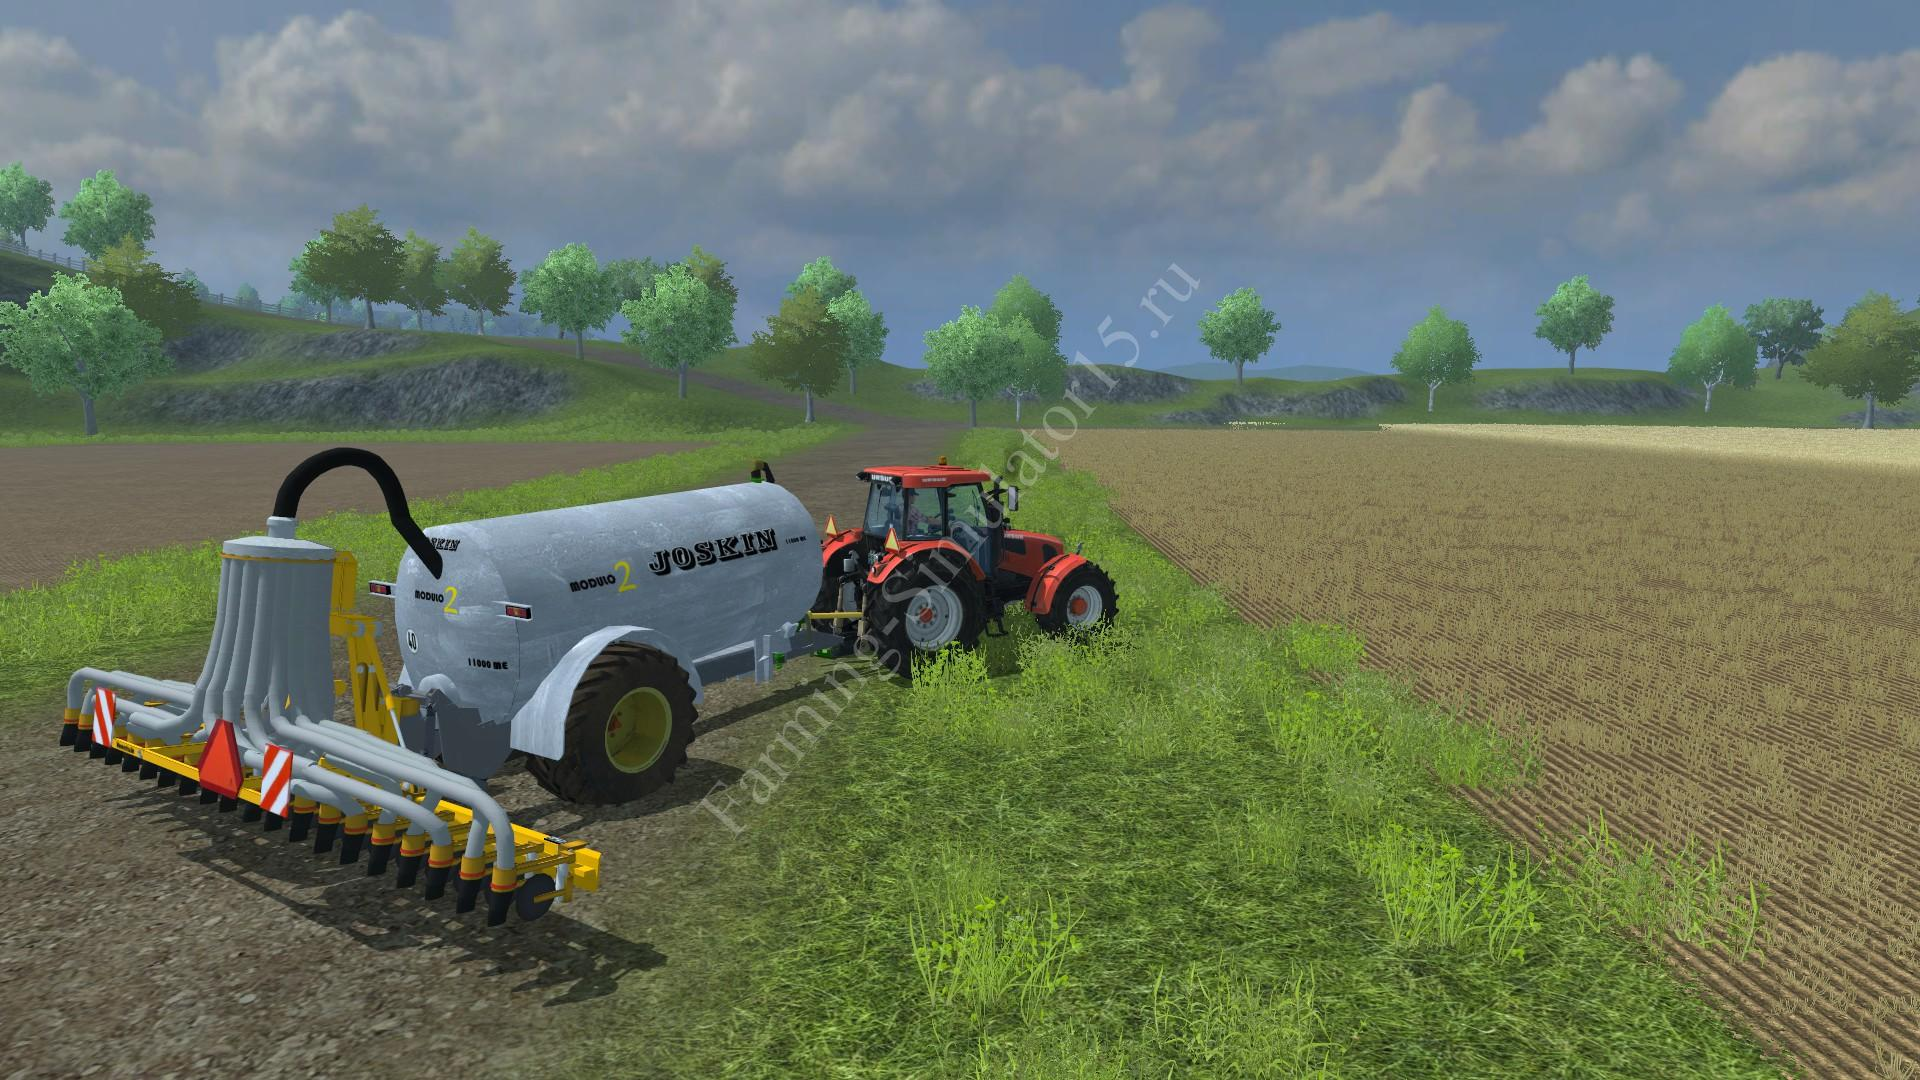 Мод прицепа для навоза Joskin modulo 2 v 1.0 Farming Simulator 2013, Farming Simulator 13